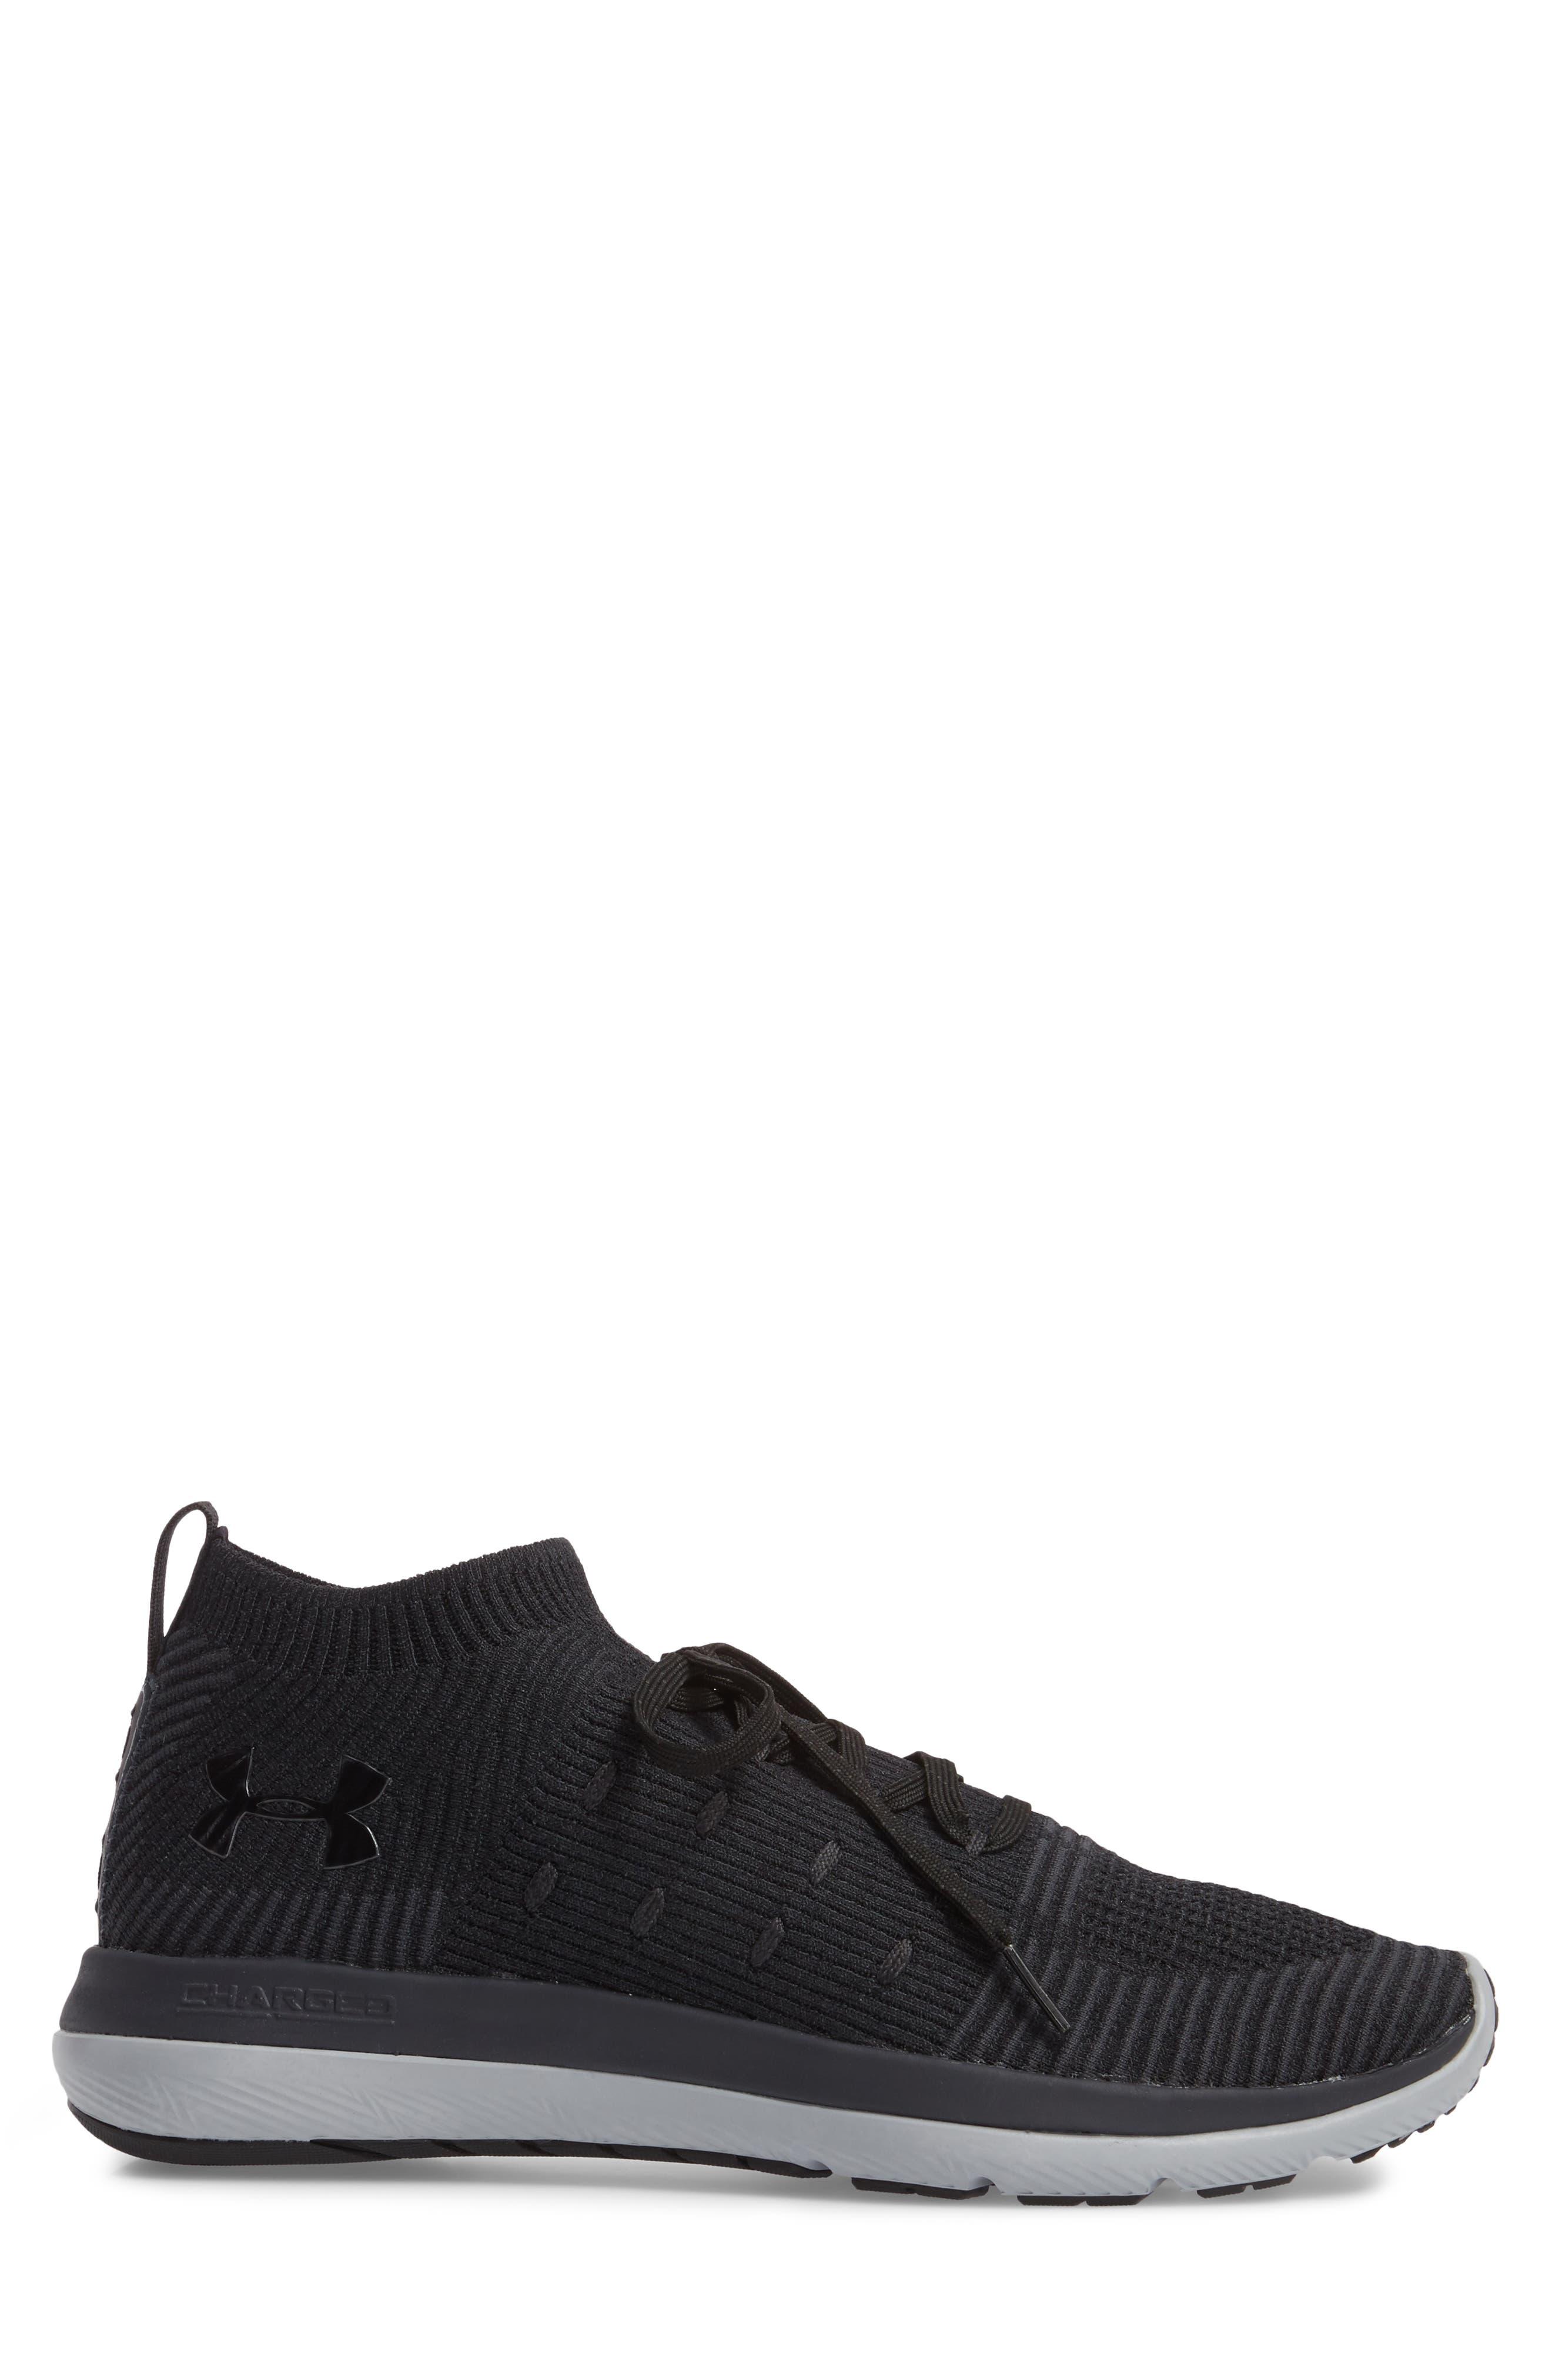 Slingflex Rise Sneaker,                             Alternate thumbnail 3, color,                             BLACK / ANTHRACITE / BLACK